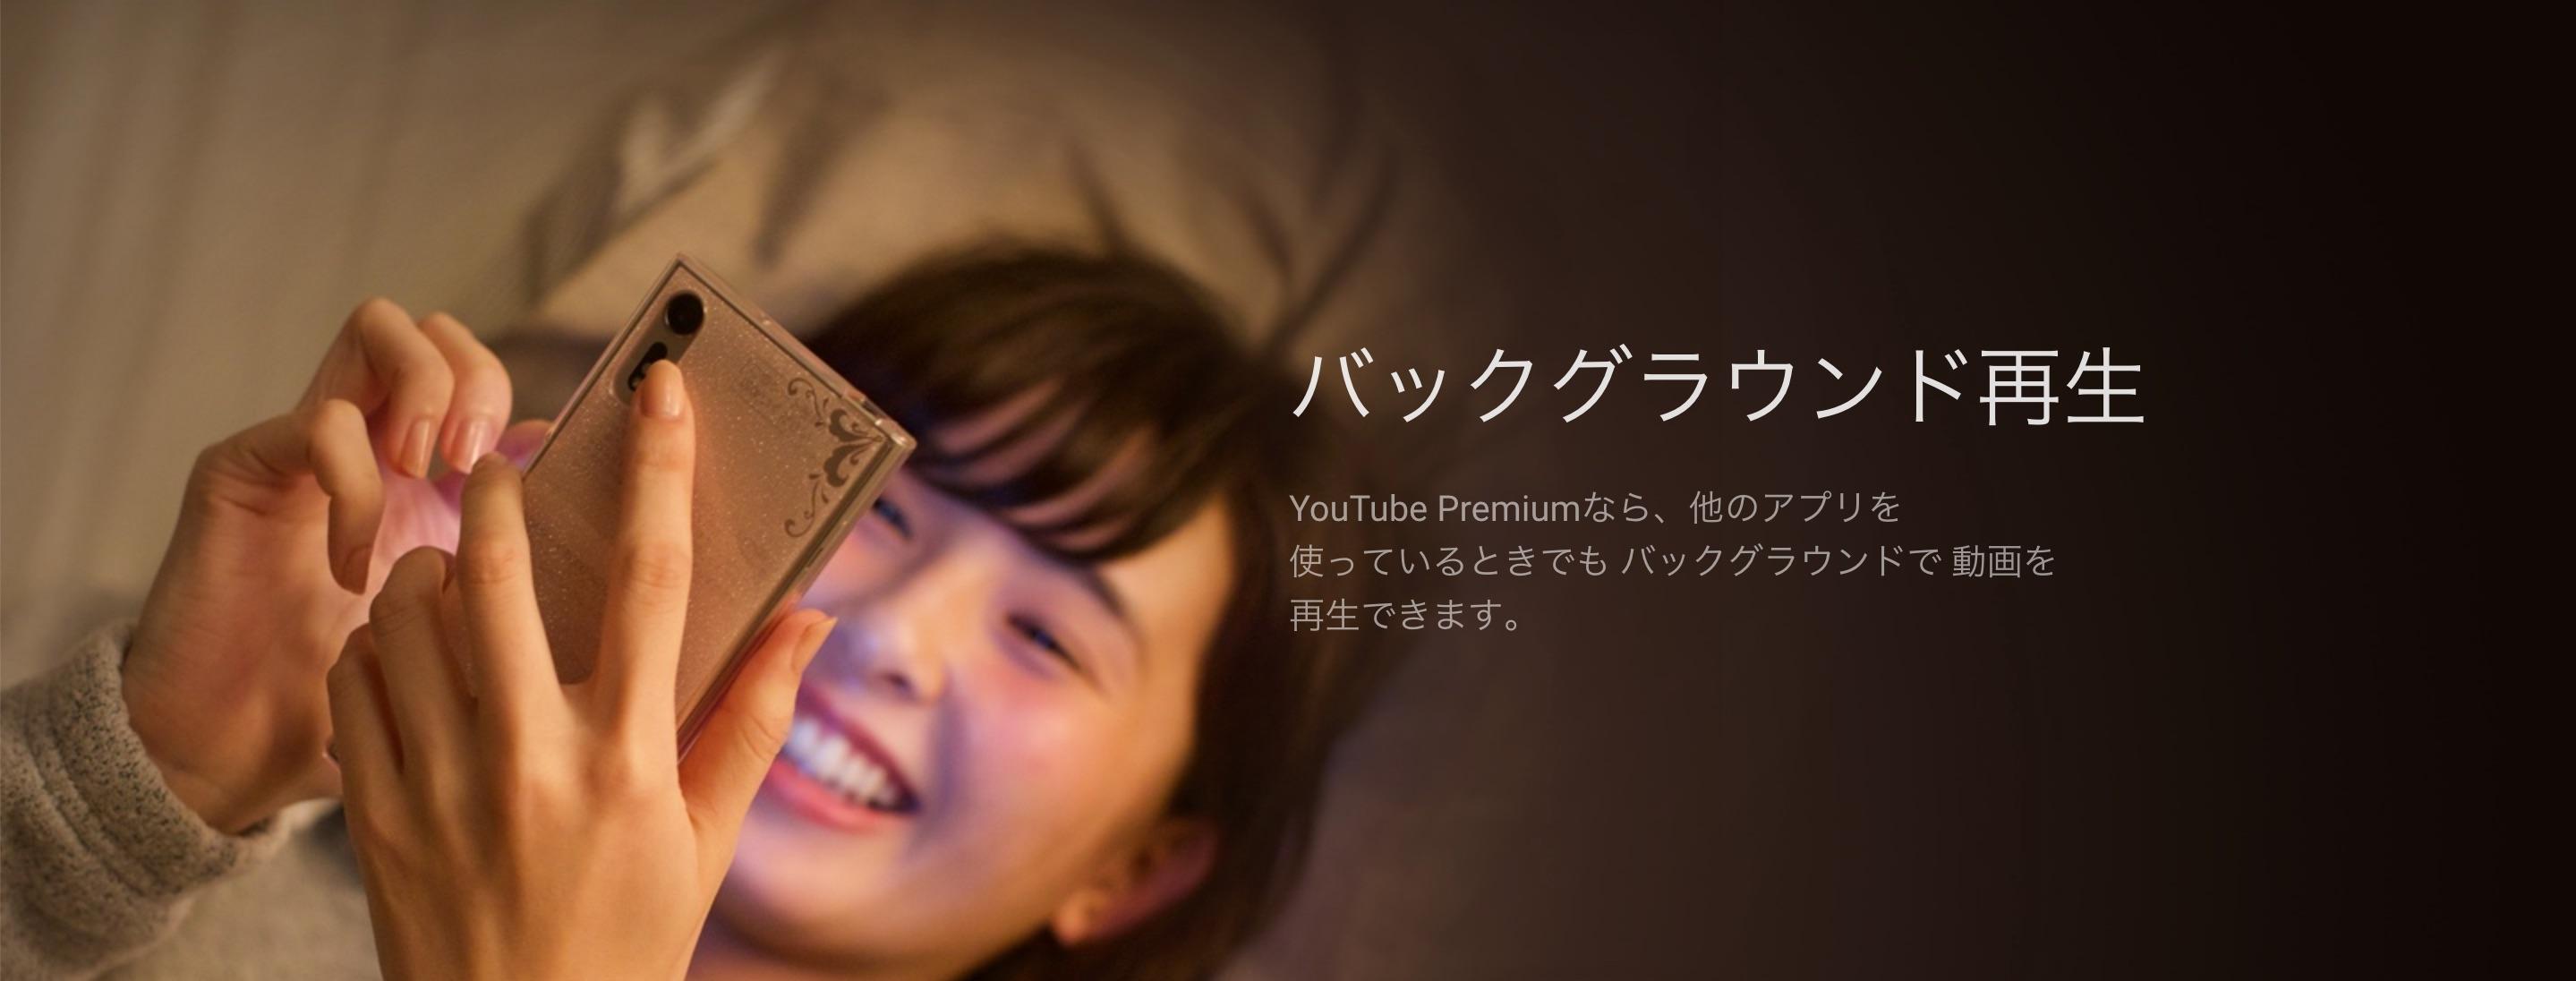 YouTube_Premium_バックグラウンド